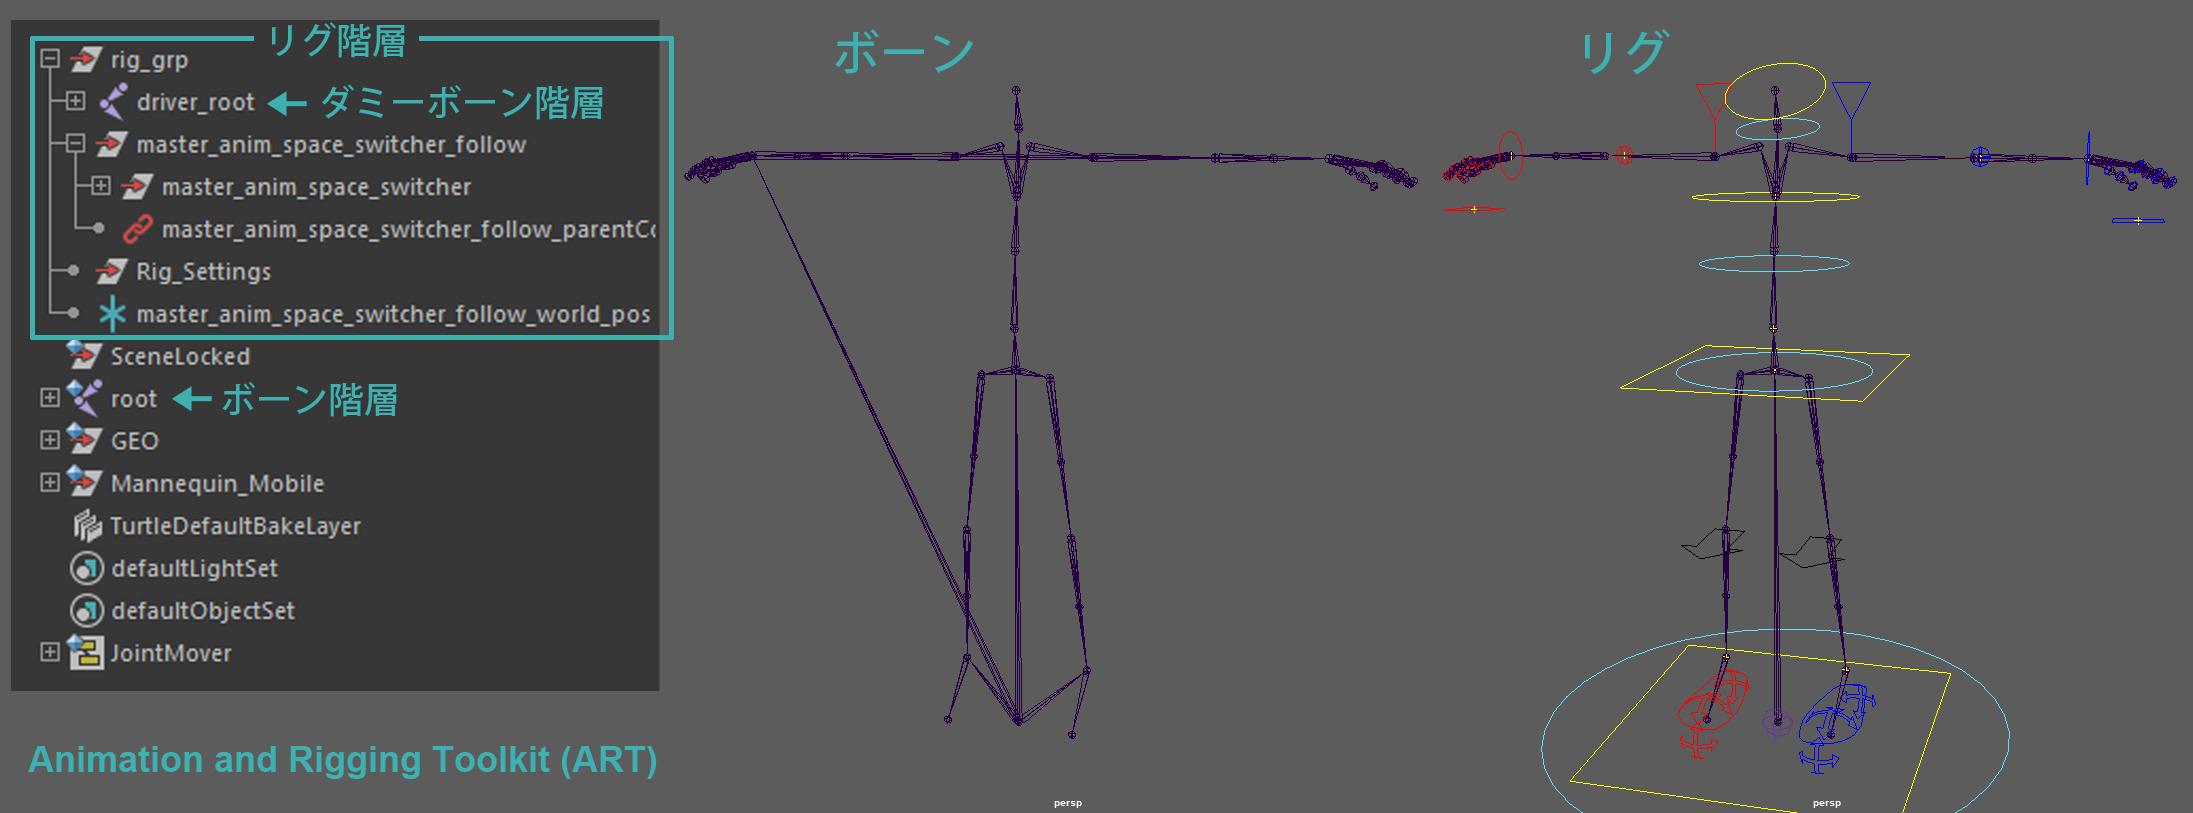 fig04_ART.jpg